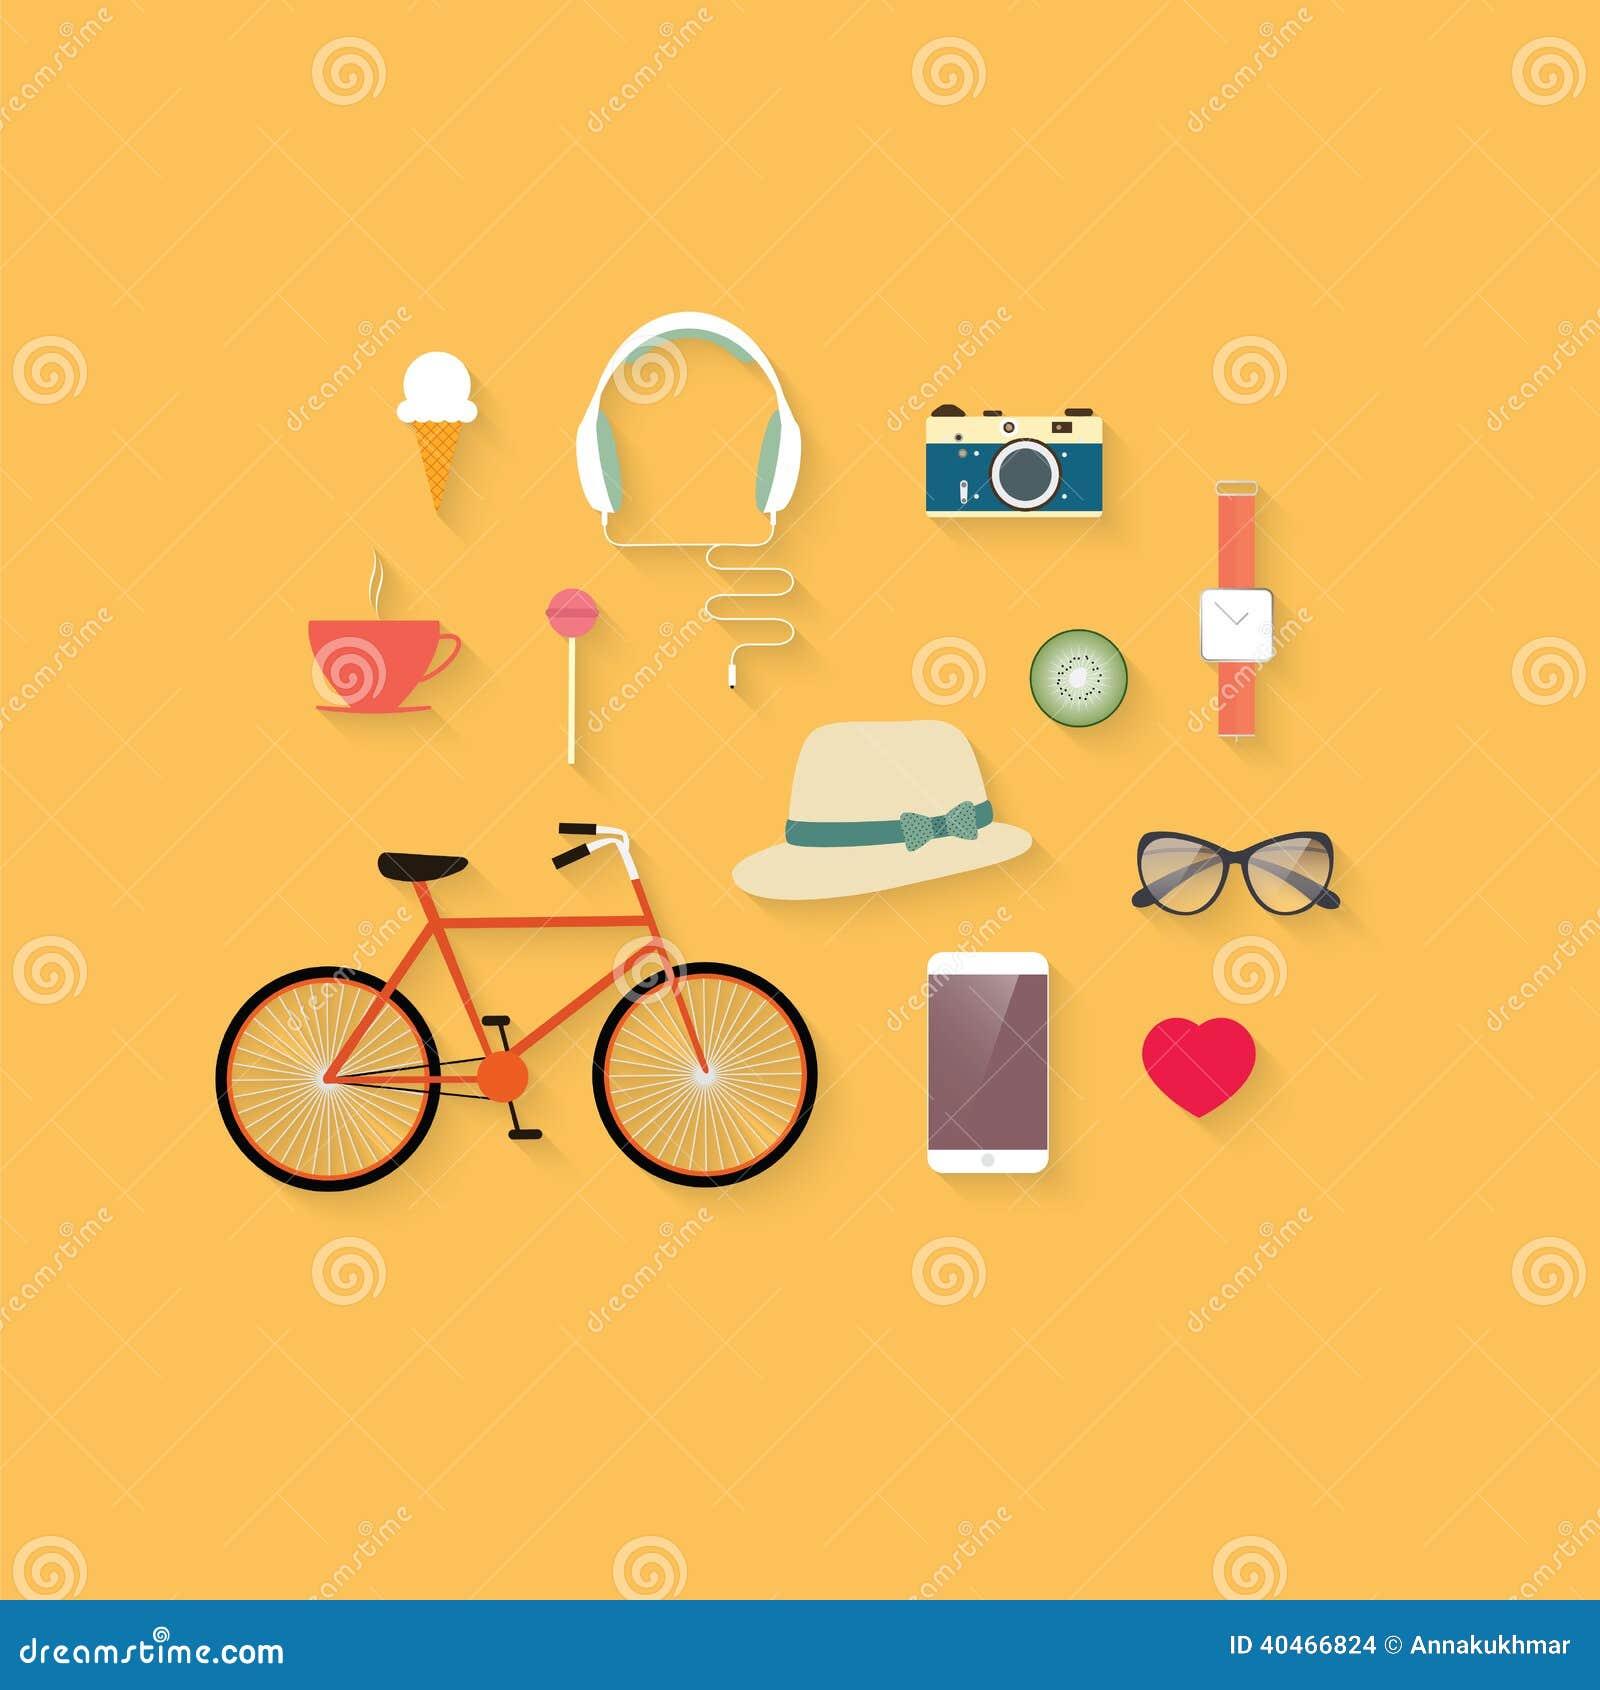 hipster flat vector icon set stock illustration illustration of